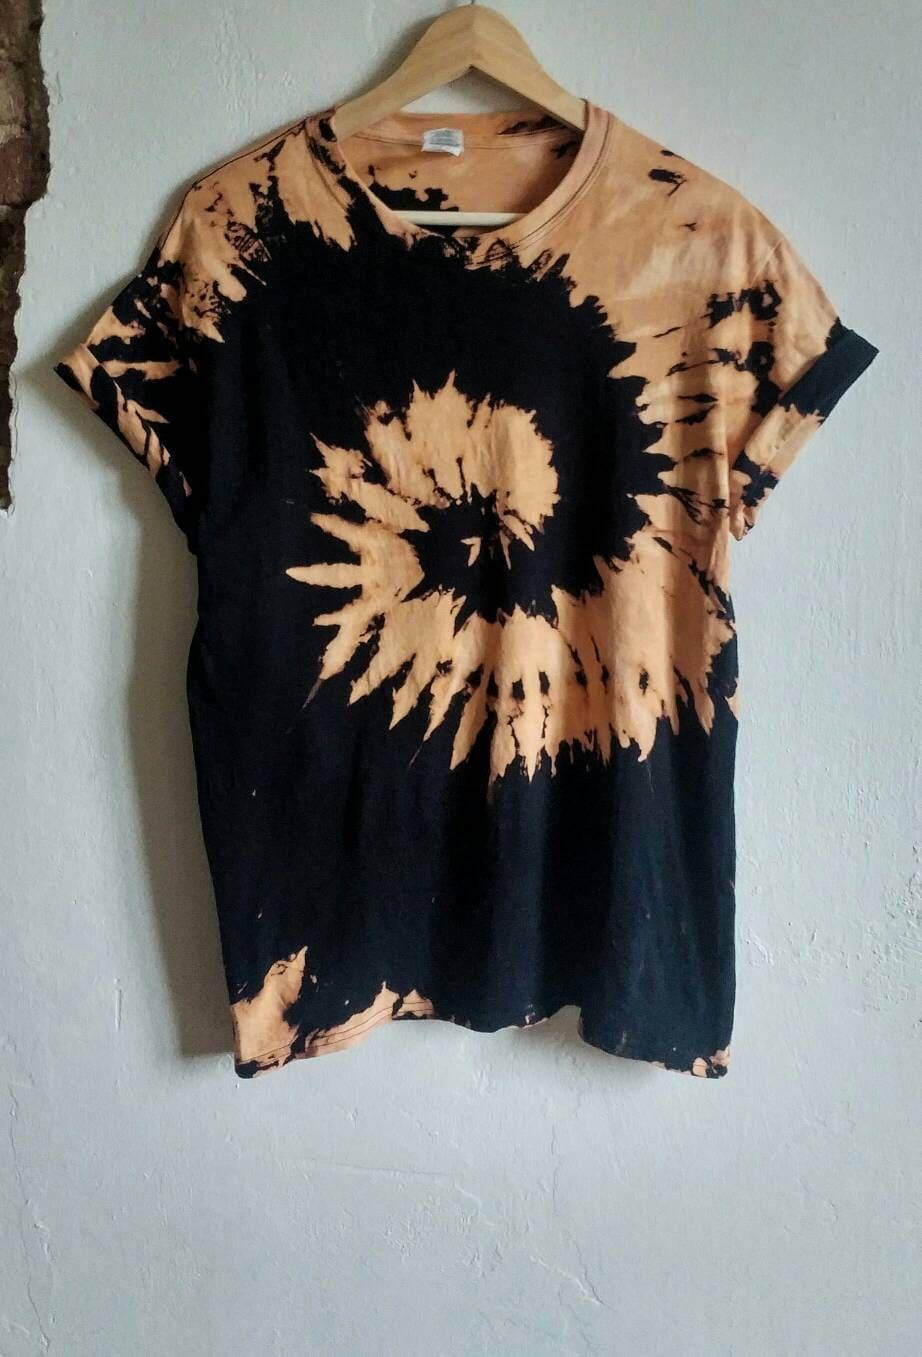 Organic Cotton Tee Bleach Tie Dye Shirt Tumblr Indie Grunge